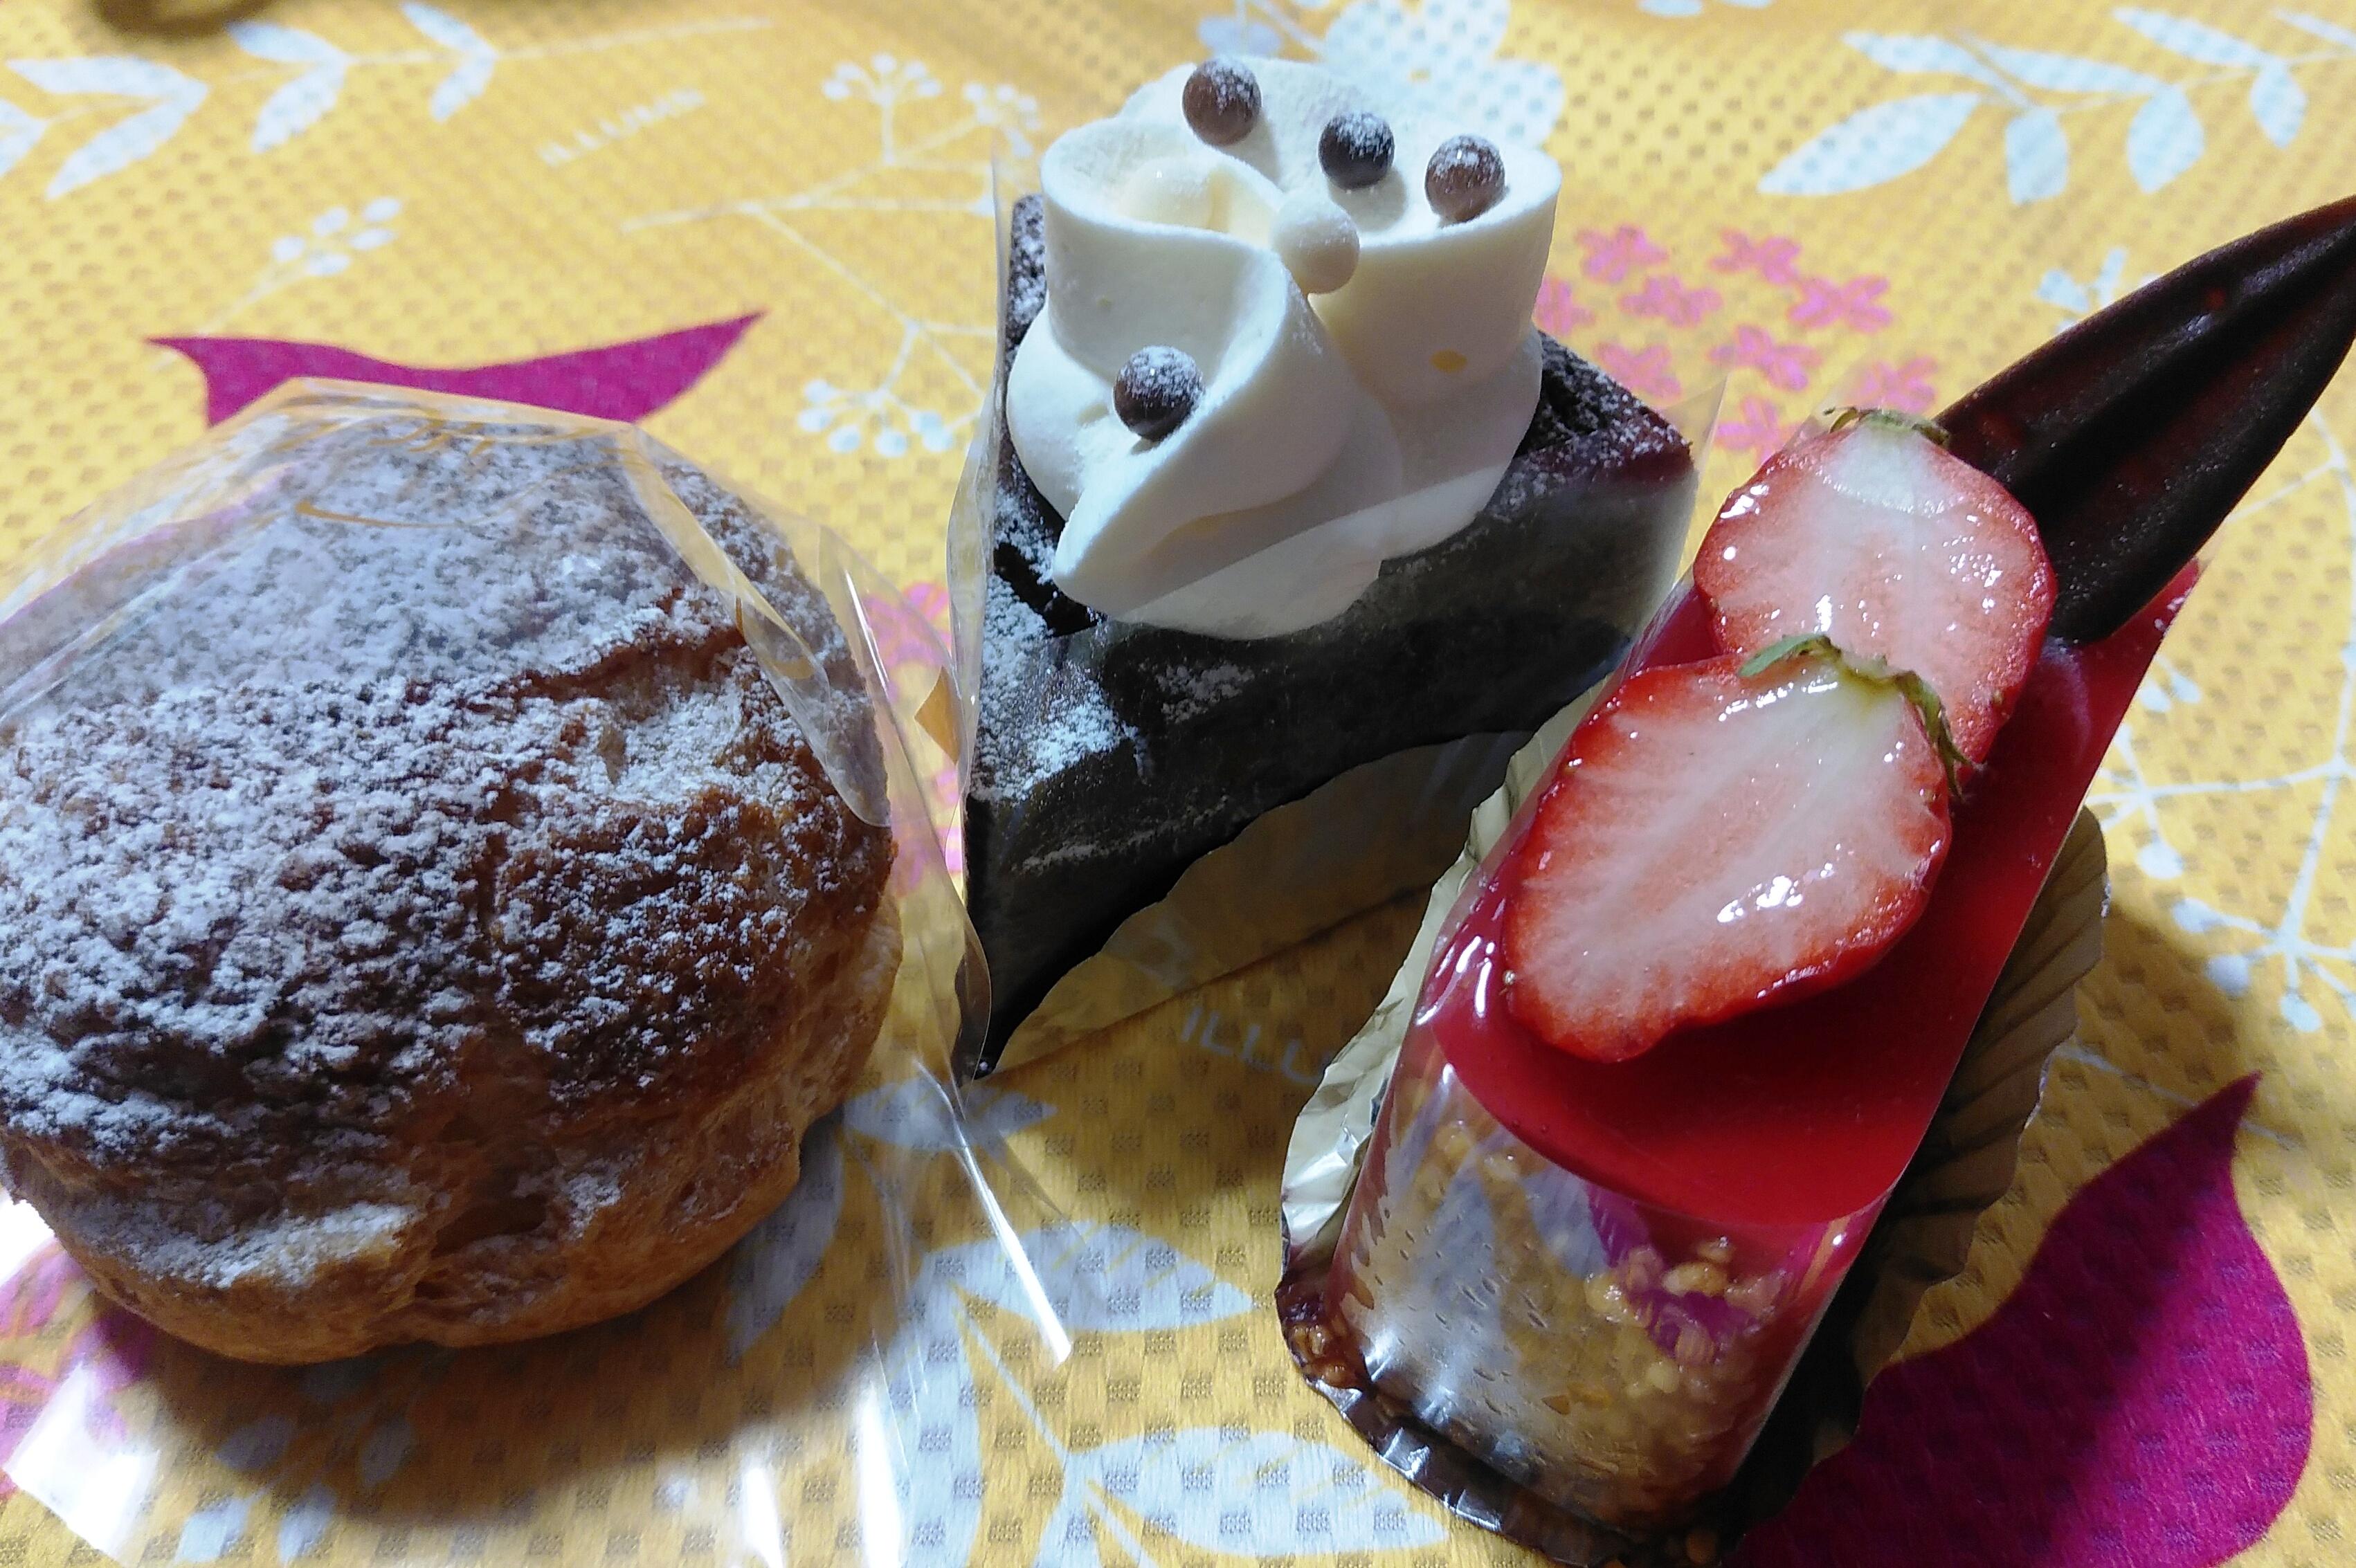 JR伊予大洲駅周辺のケーキ屋めぐり第1弾!「melo洋菓子店」へ行ってきました!